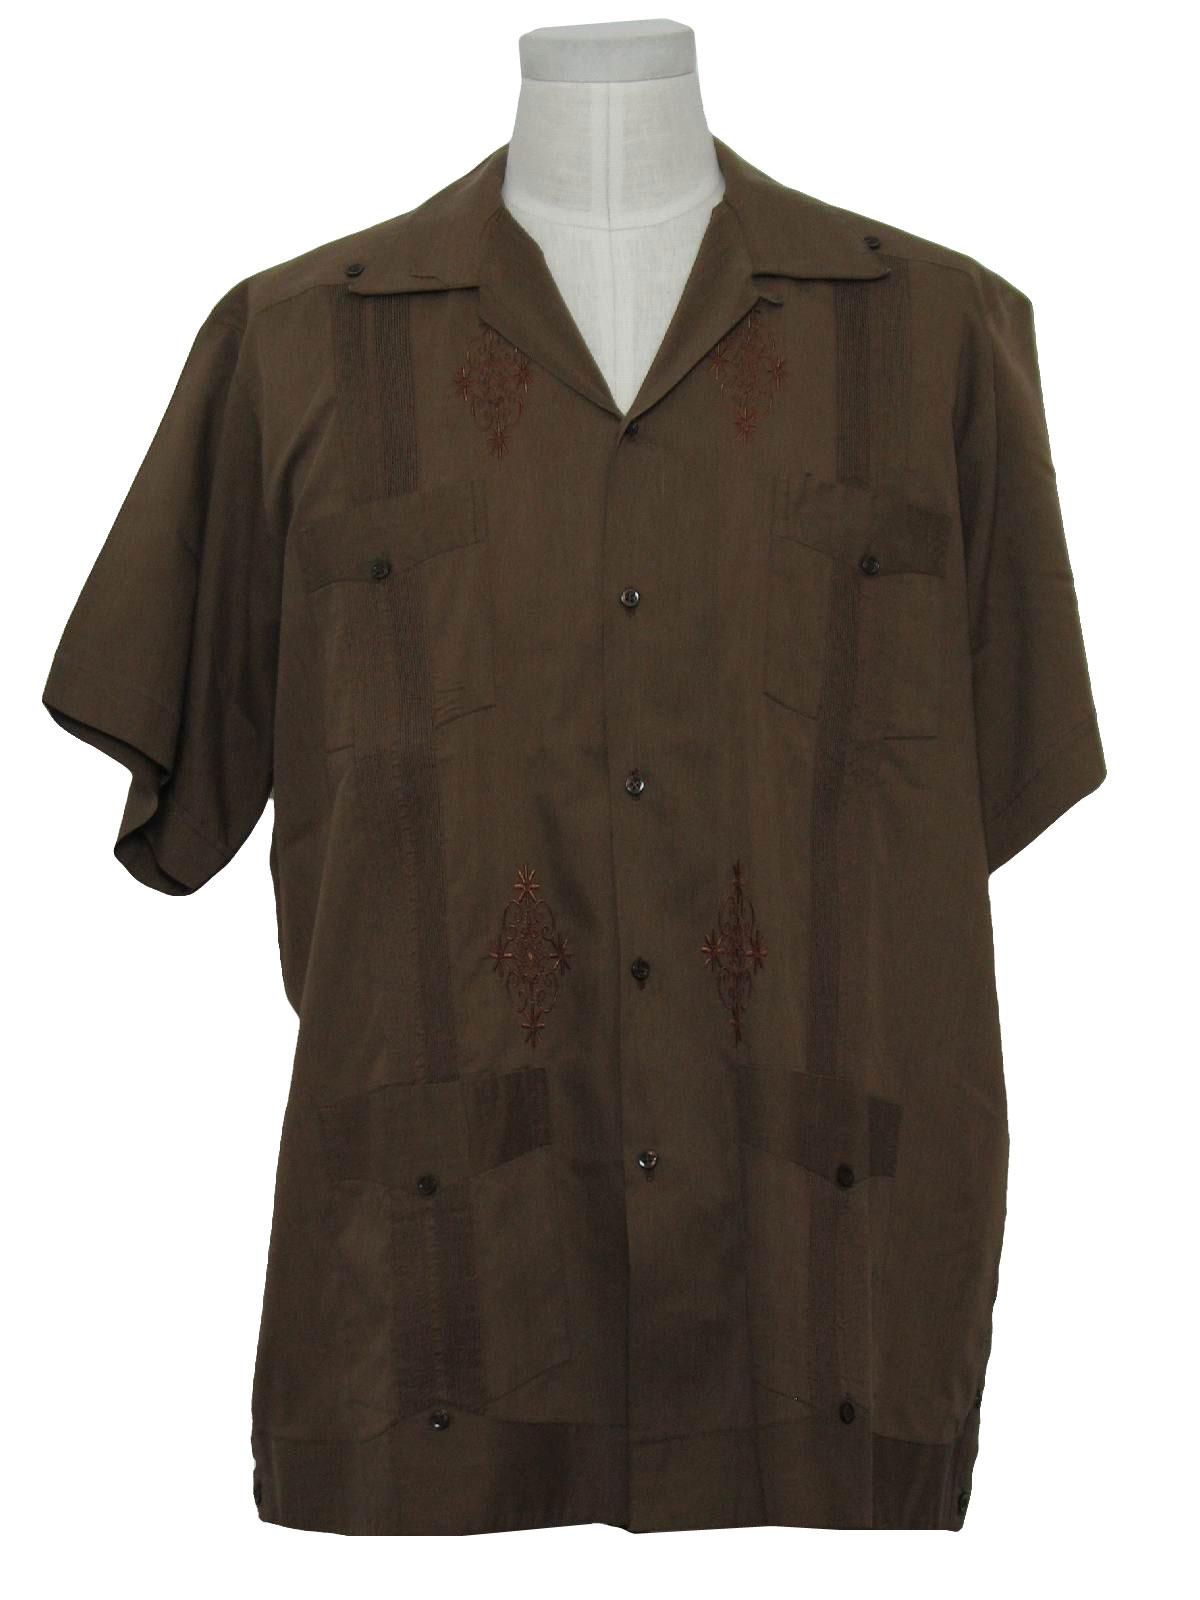 b0d3c6f91c Vintage Guayaberas Yucatecas 80 s Guayabera Shirt  80s -Guayaberas ...